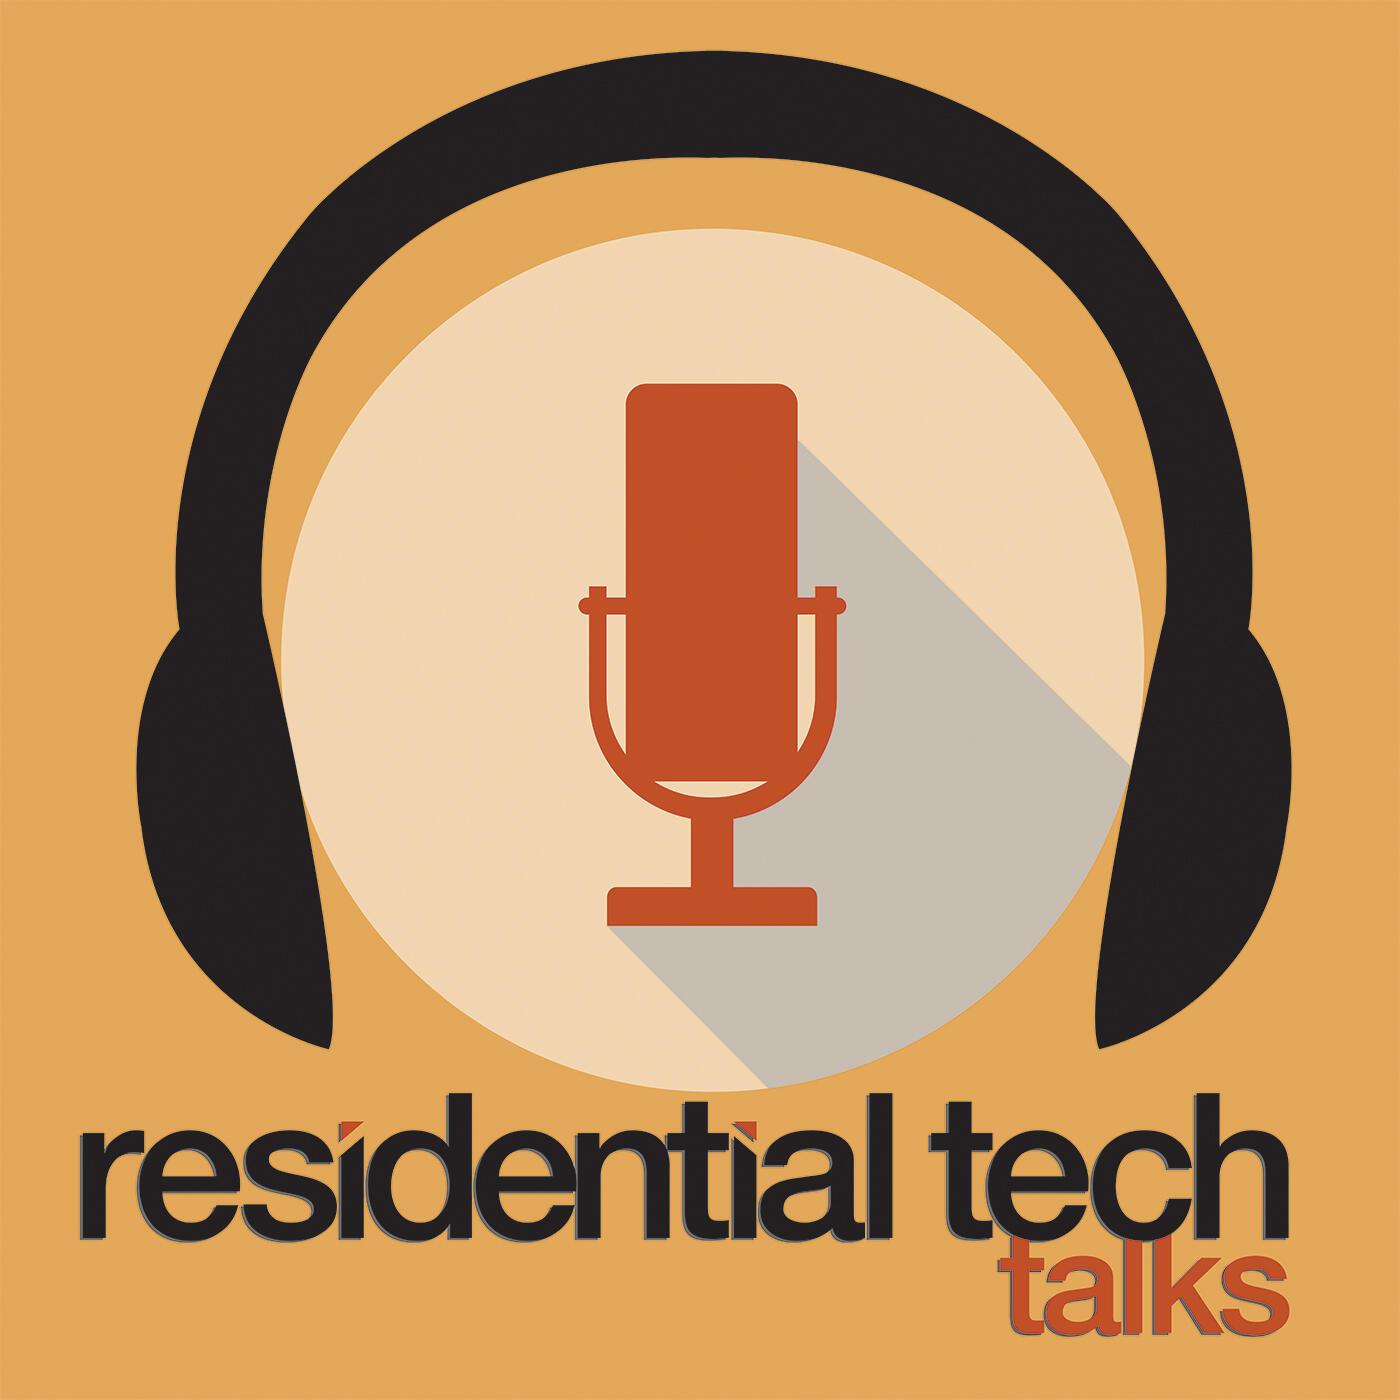 Residential Tech Talks